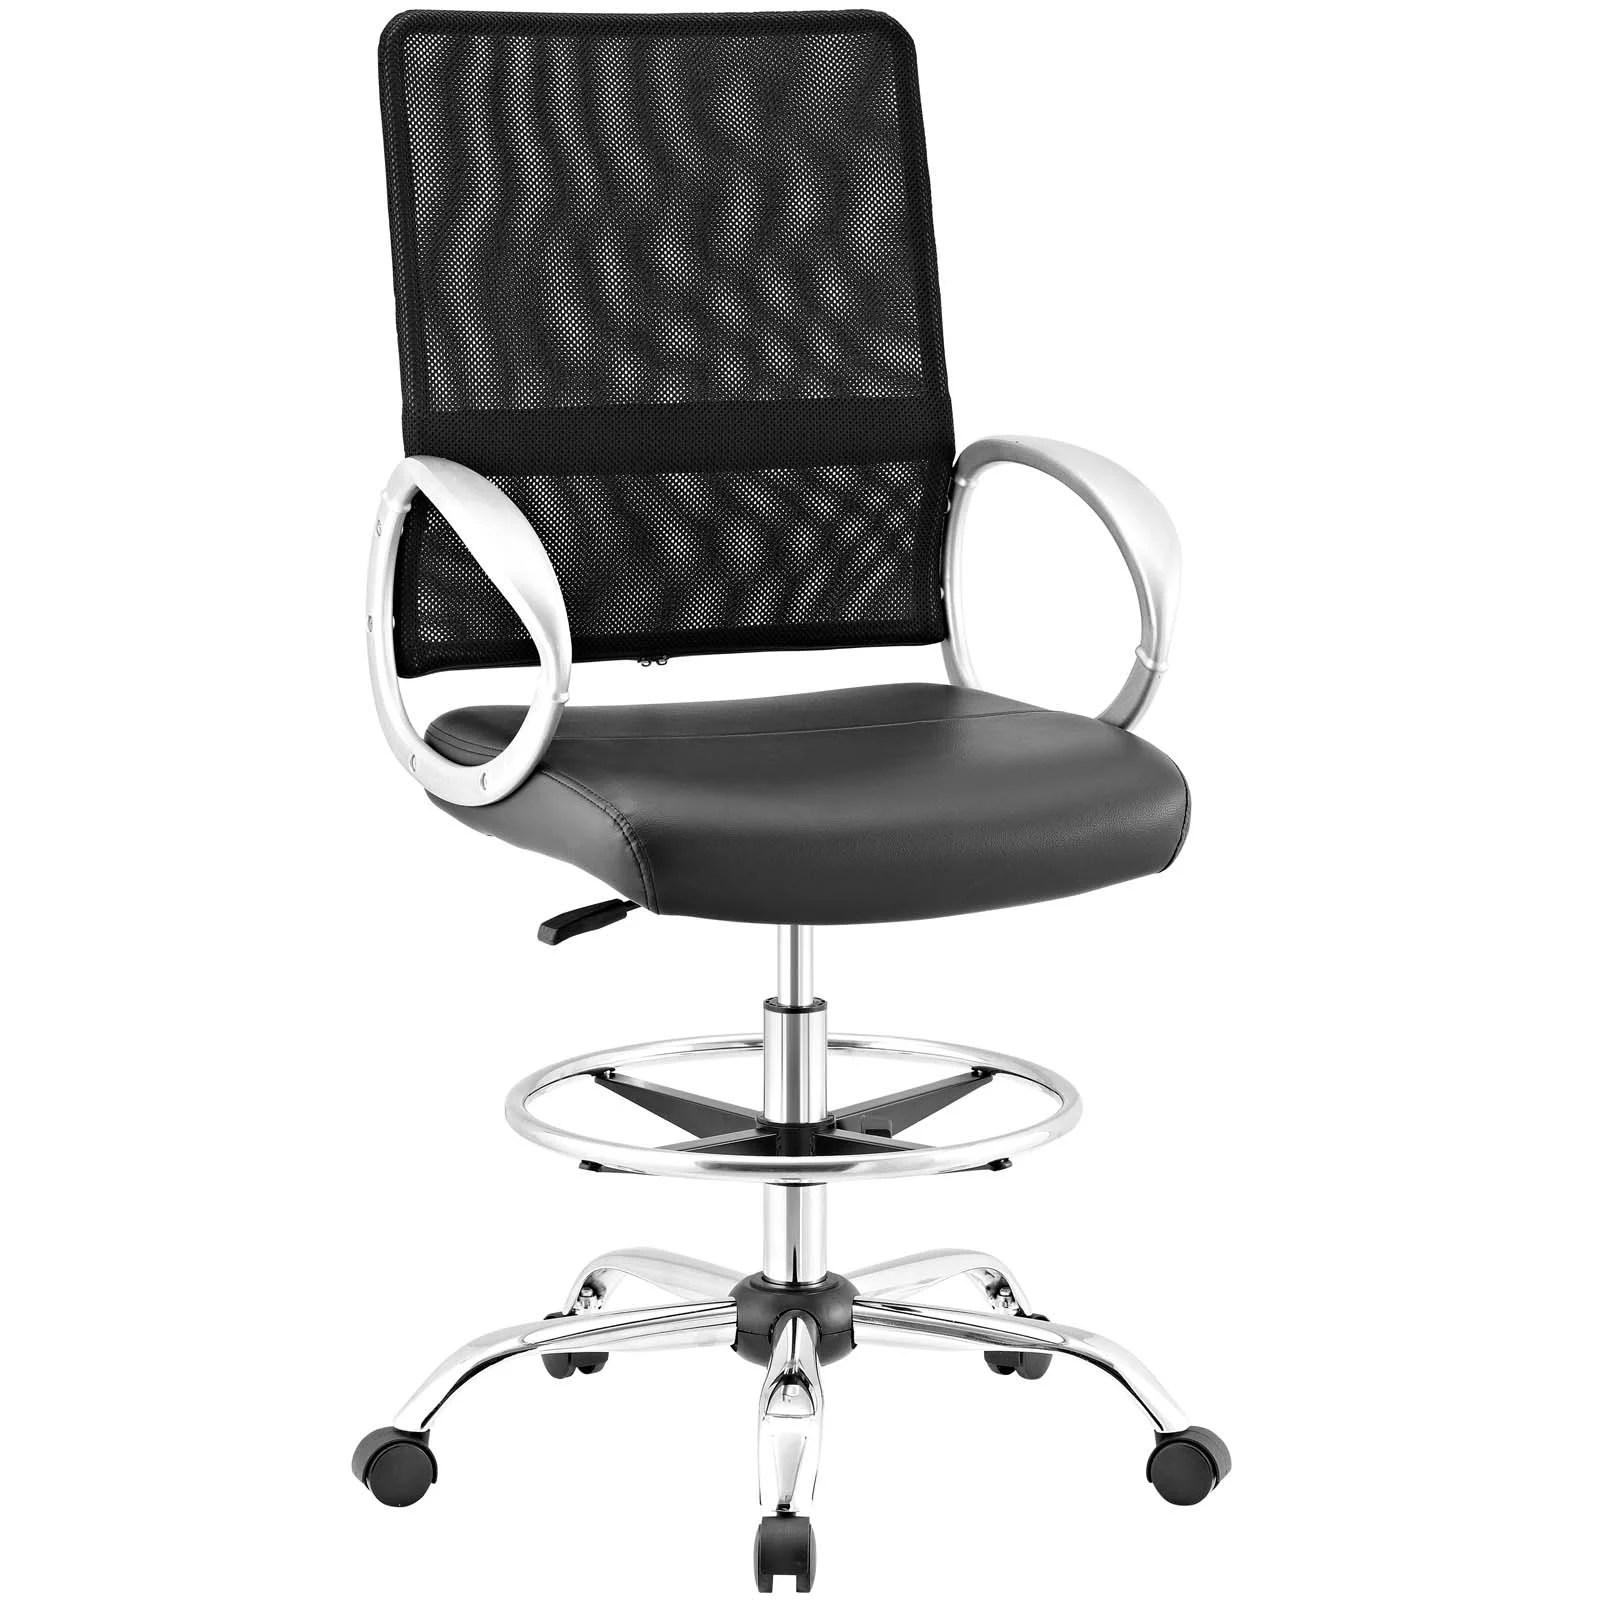 mesh drafting chair aluminum rocking patio chairs orren ellis hamler ergonomic ebay details about